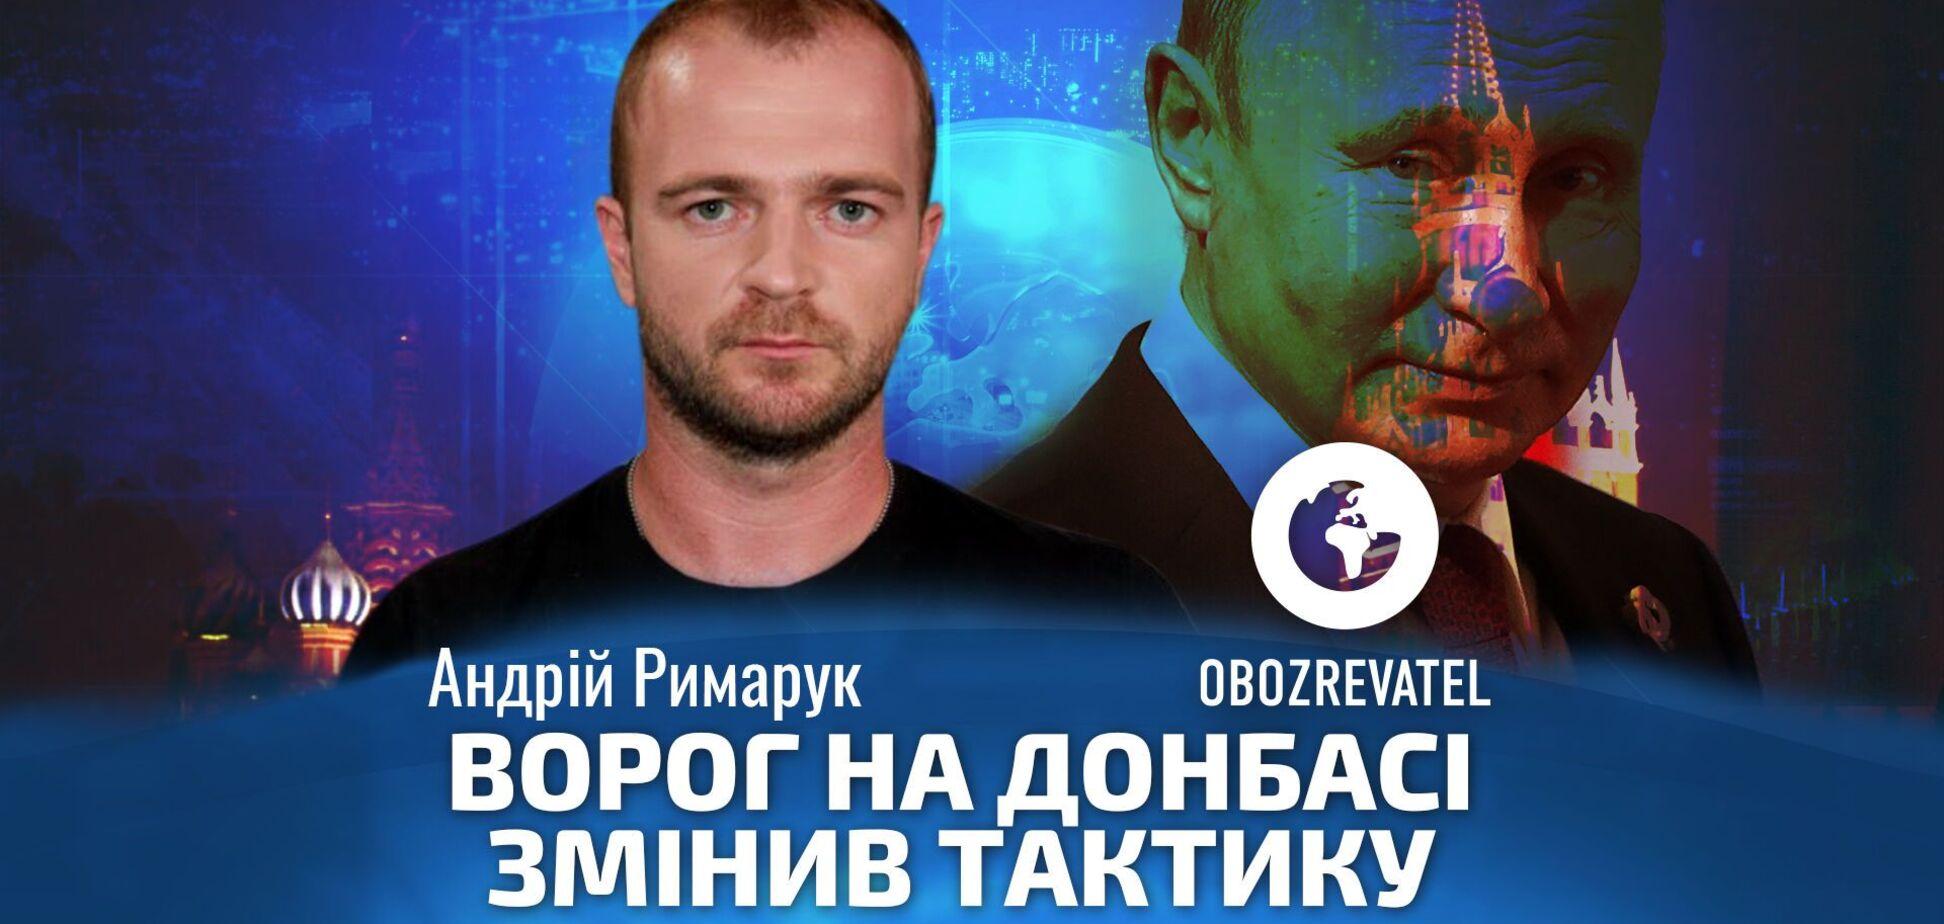 Рымарук: враг на Донбассе сменил тактику